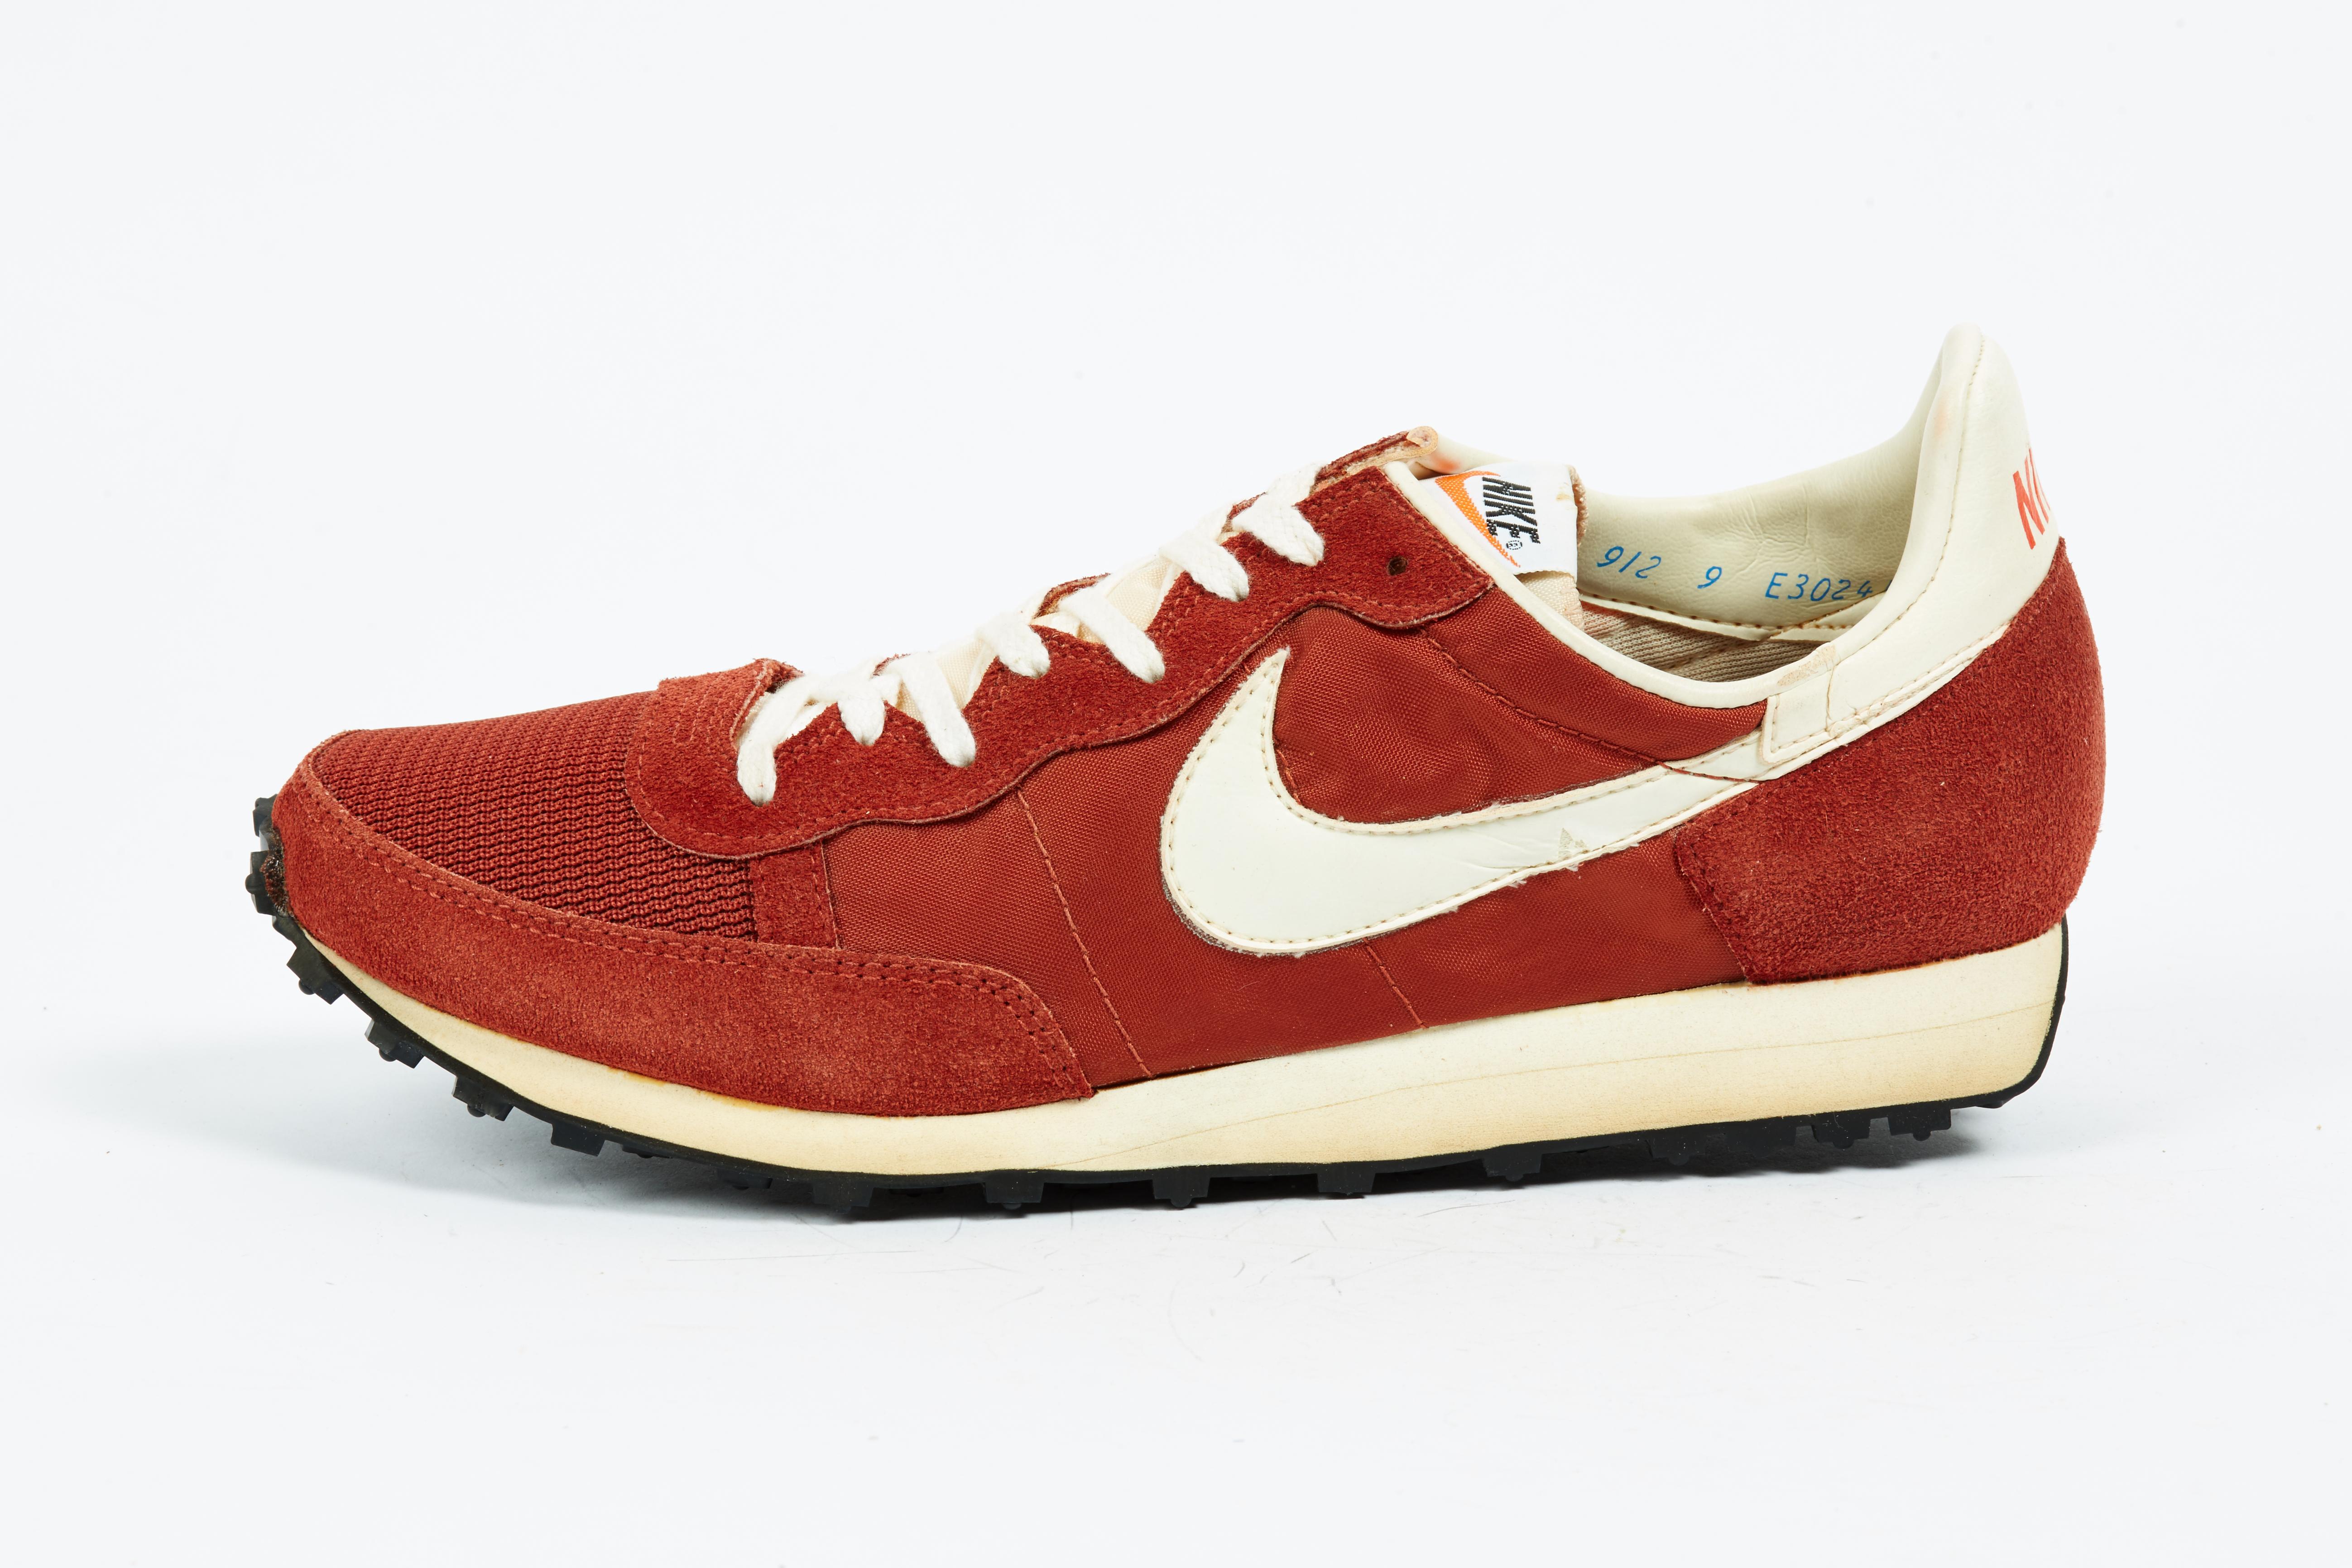 Vintage 1979 Nike Challenger - Shoes